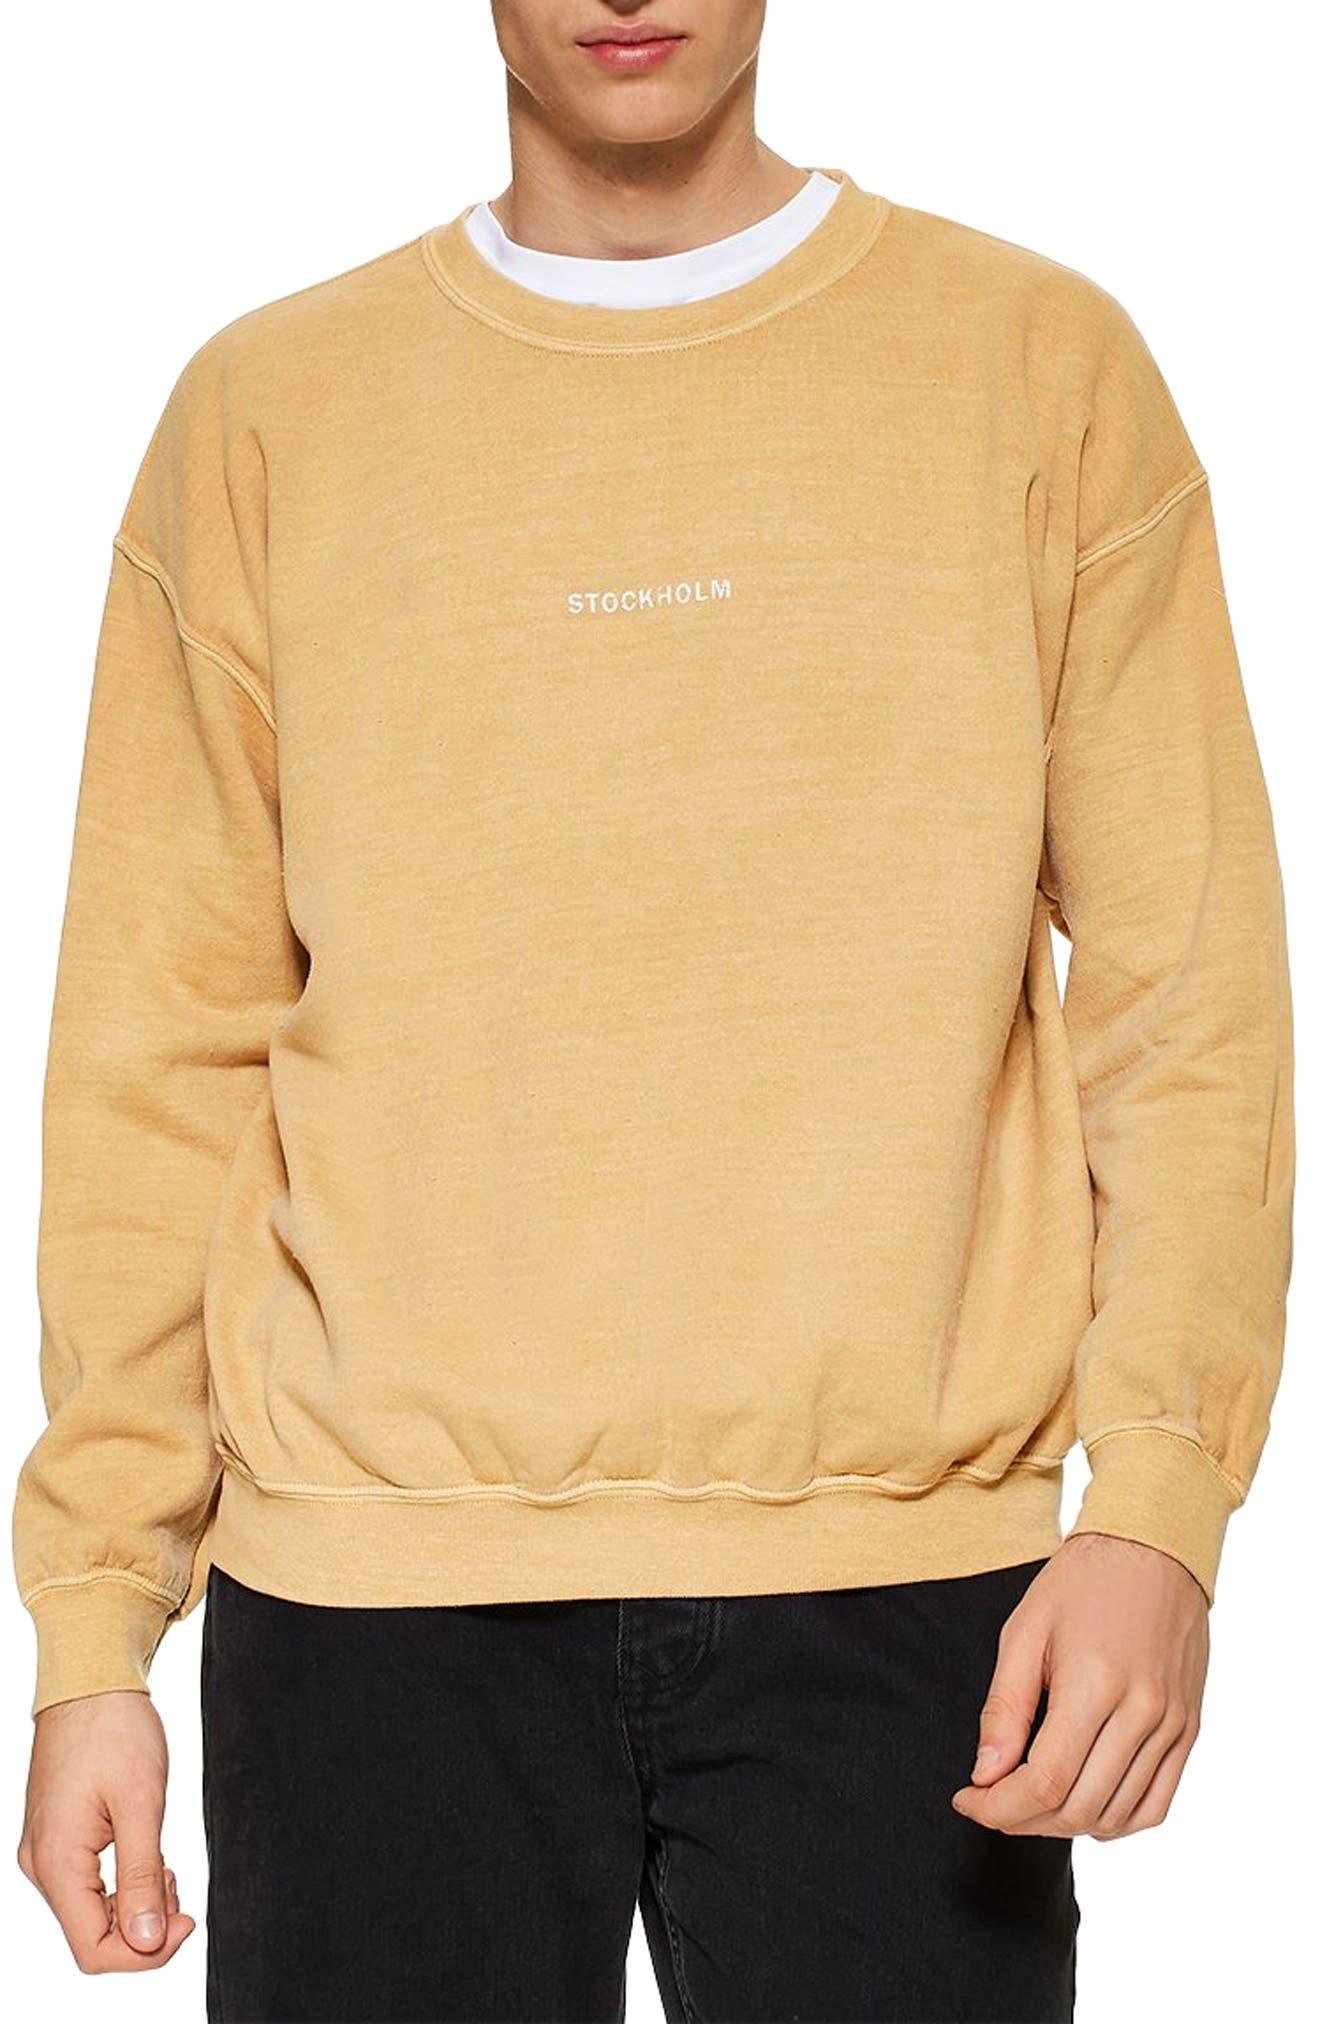 TOPMAN, Stockholm Sweatshirt, Main thumbnail 1, color, YELLOW